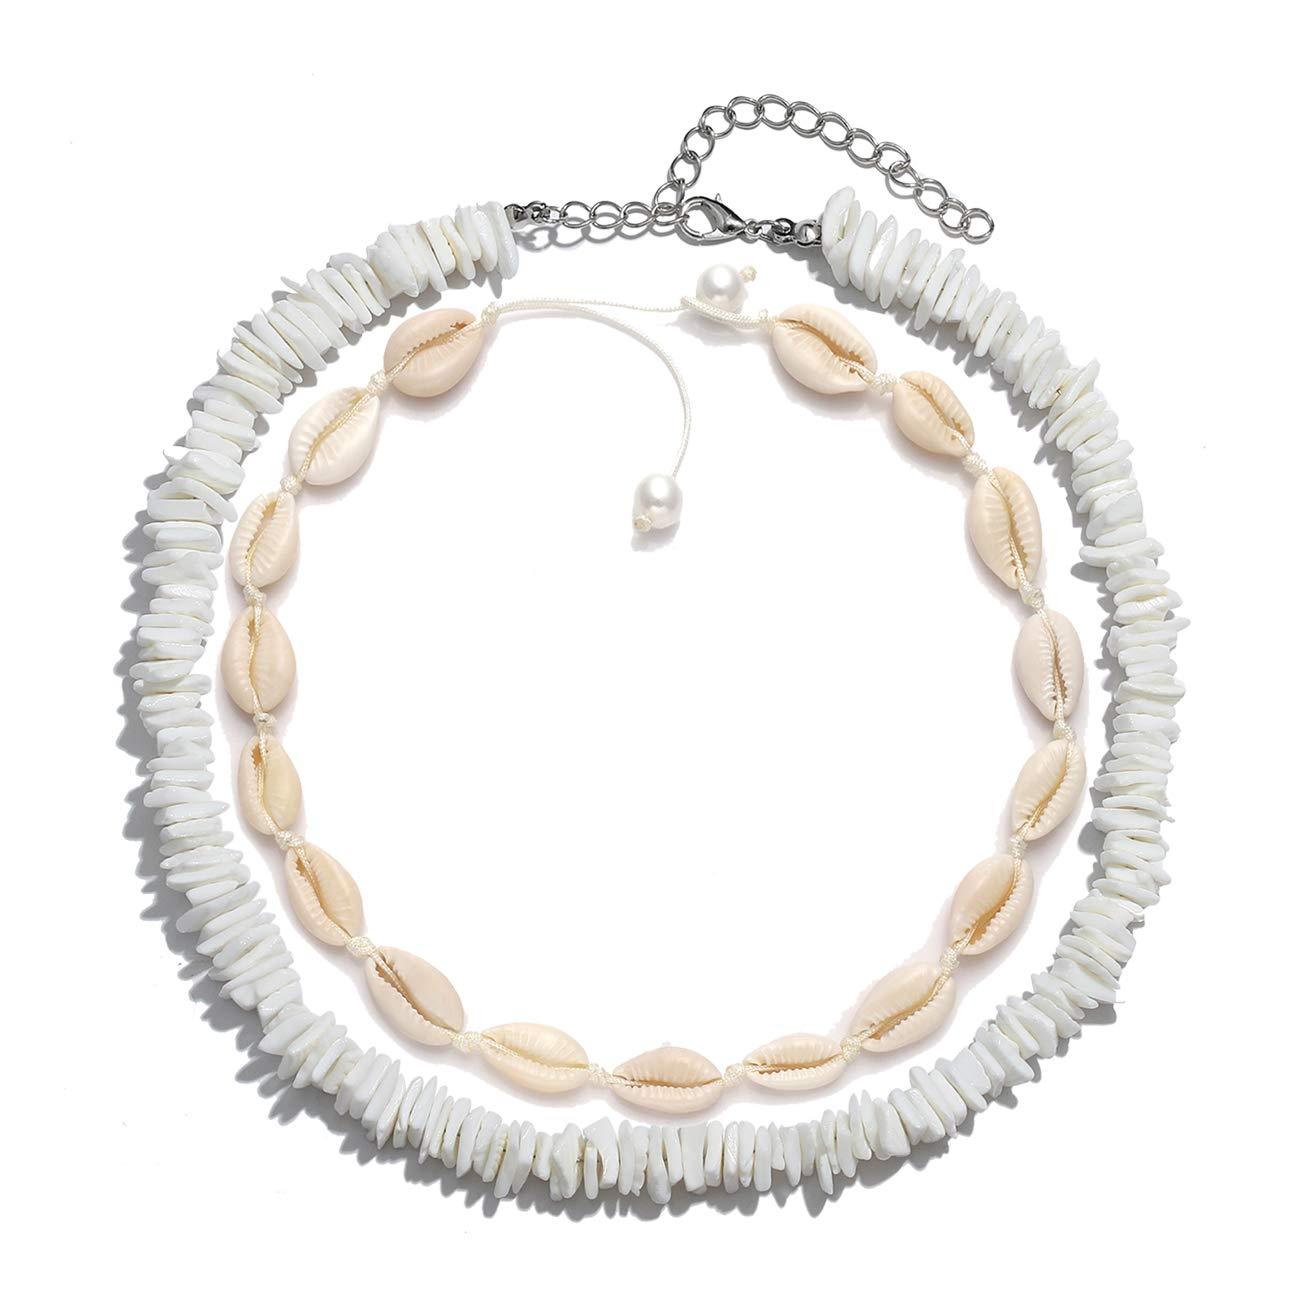 HSWE Shell Choker Necklace for Women Seashell Necklace Statement Adjustable Puka Shell Pendant Cord Bib Collar Necklace Bracelets Set Hawaiian Jewelry (Shell Necklace Set#1)